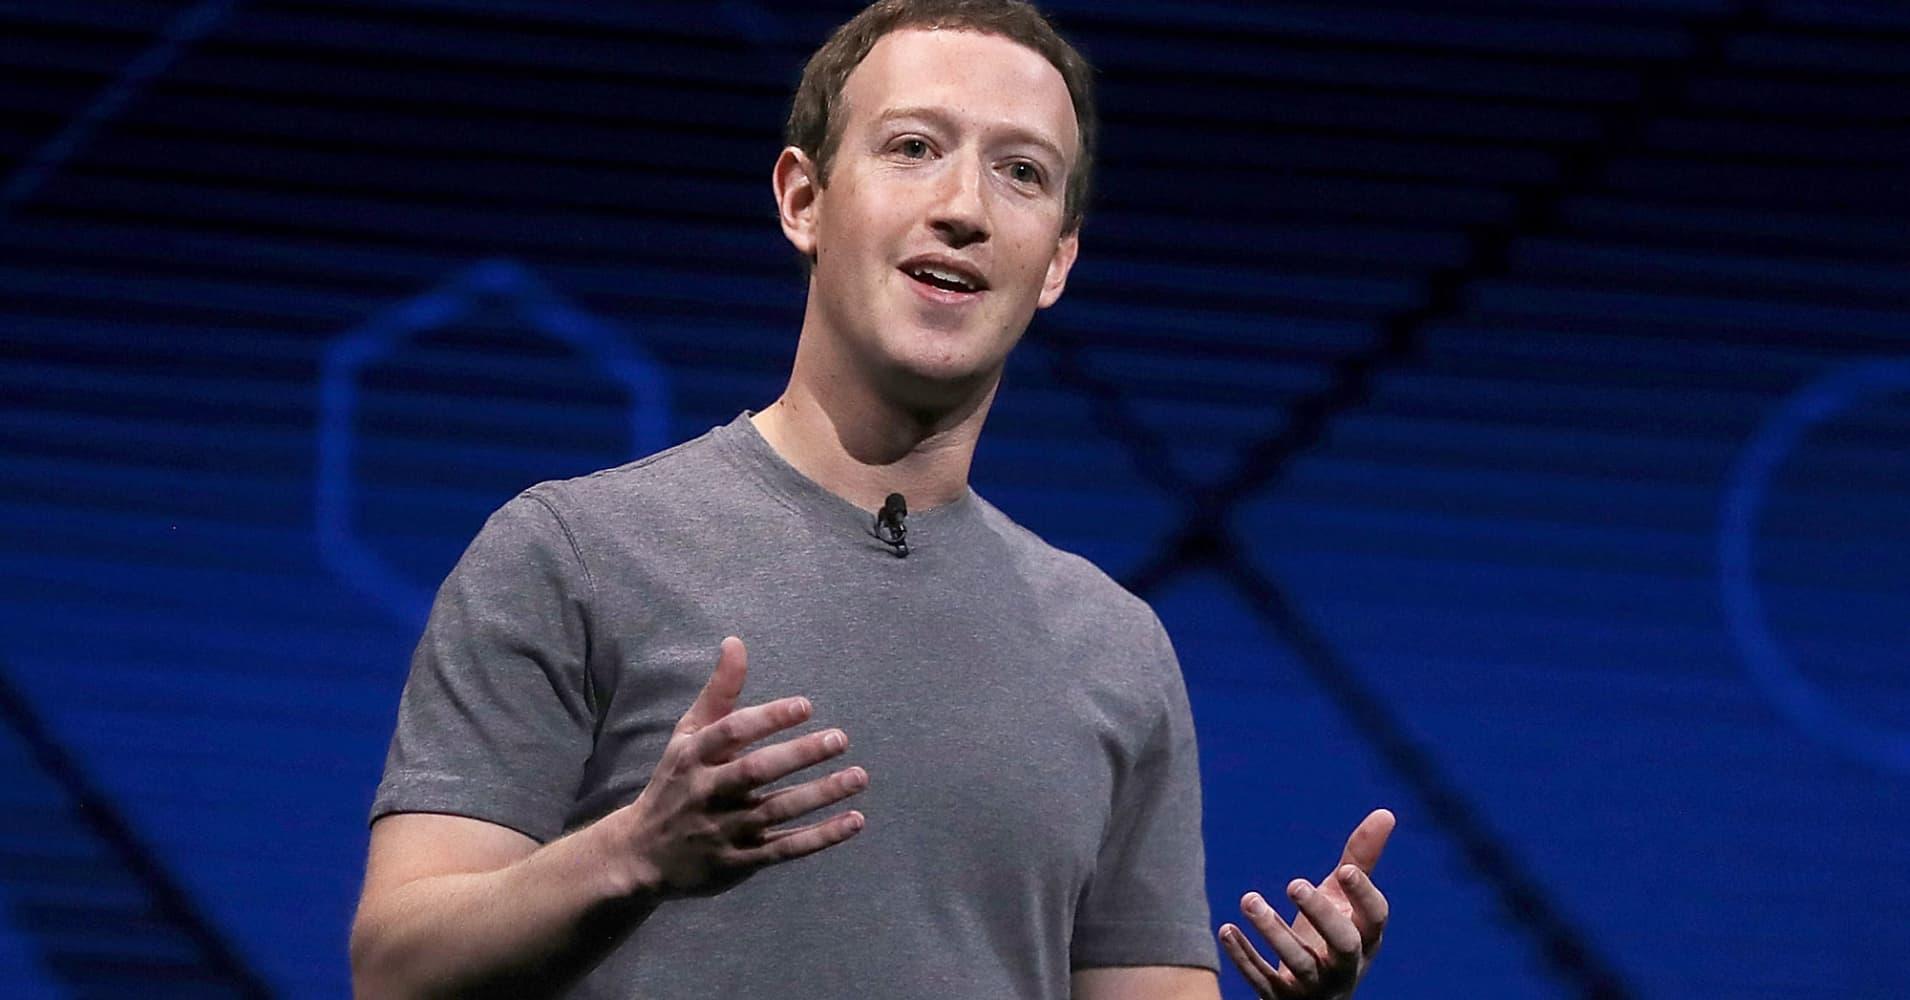 Live like a billionaire: The daily habits of Elon Musk, Mark Zuckerberg, Warren Buffett, Bill Gates